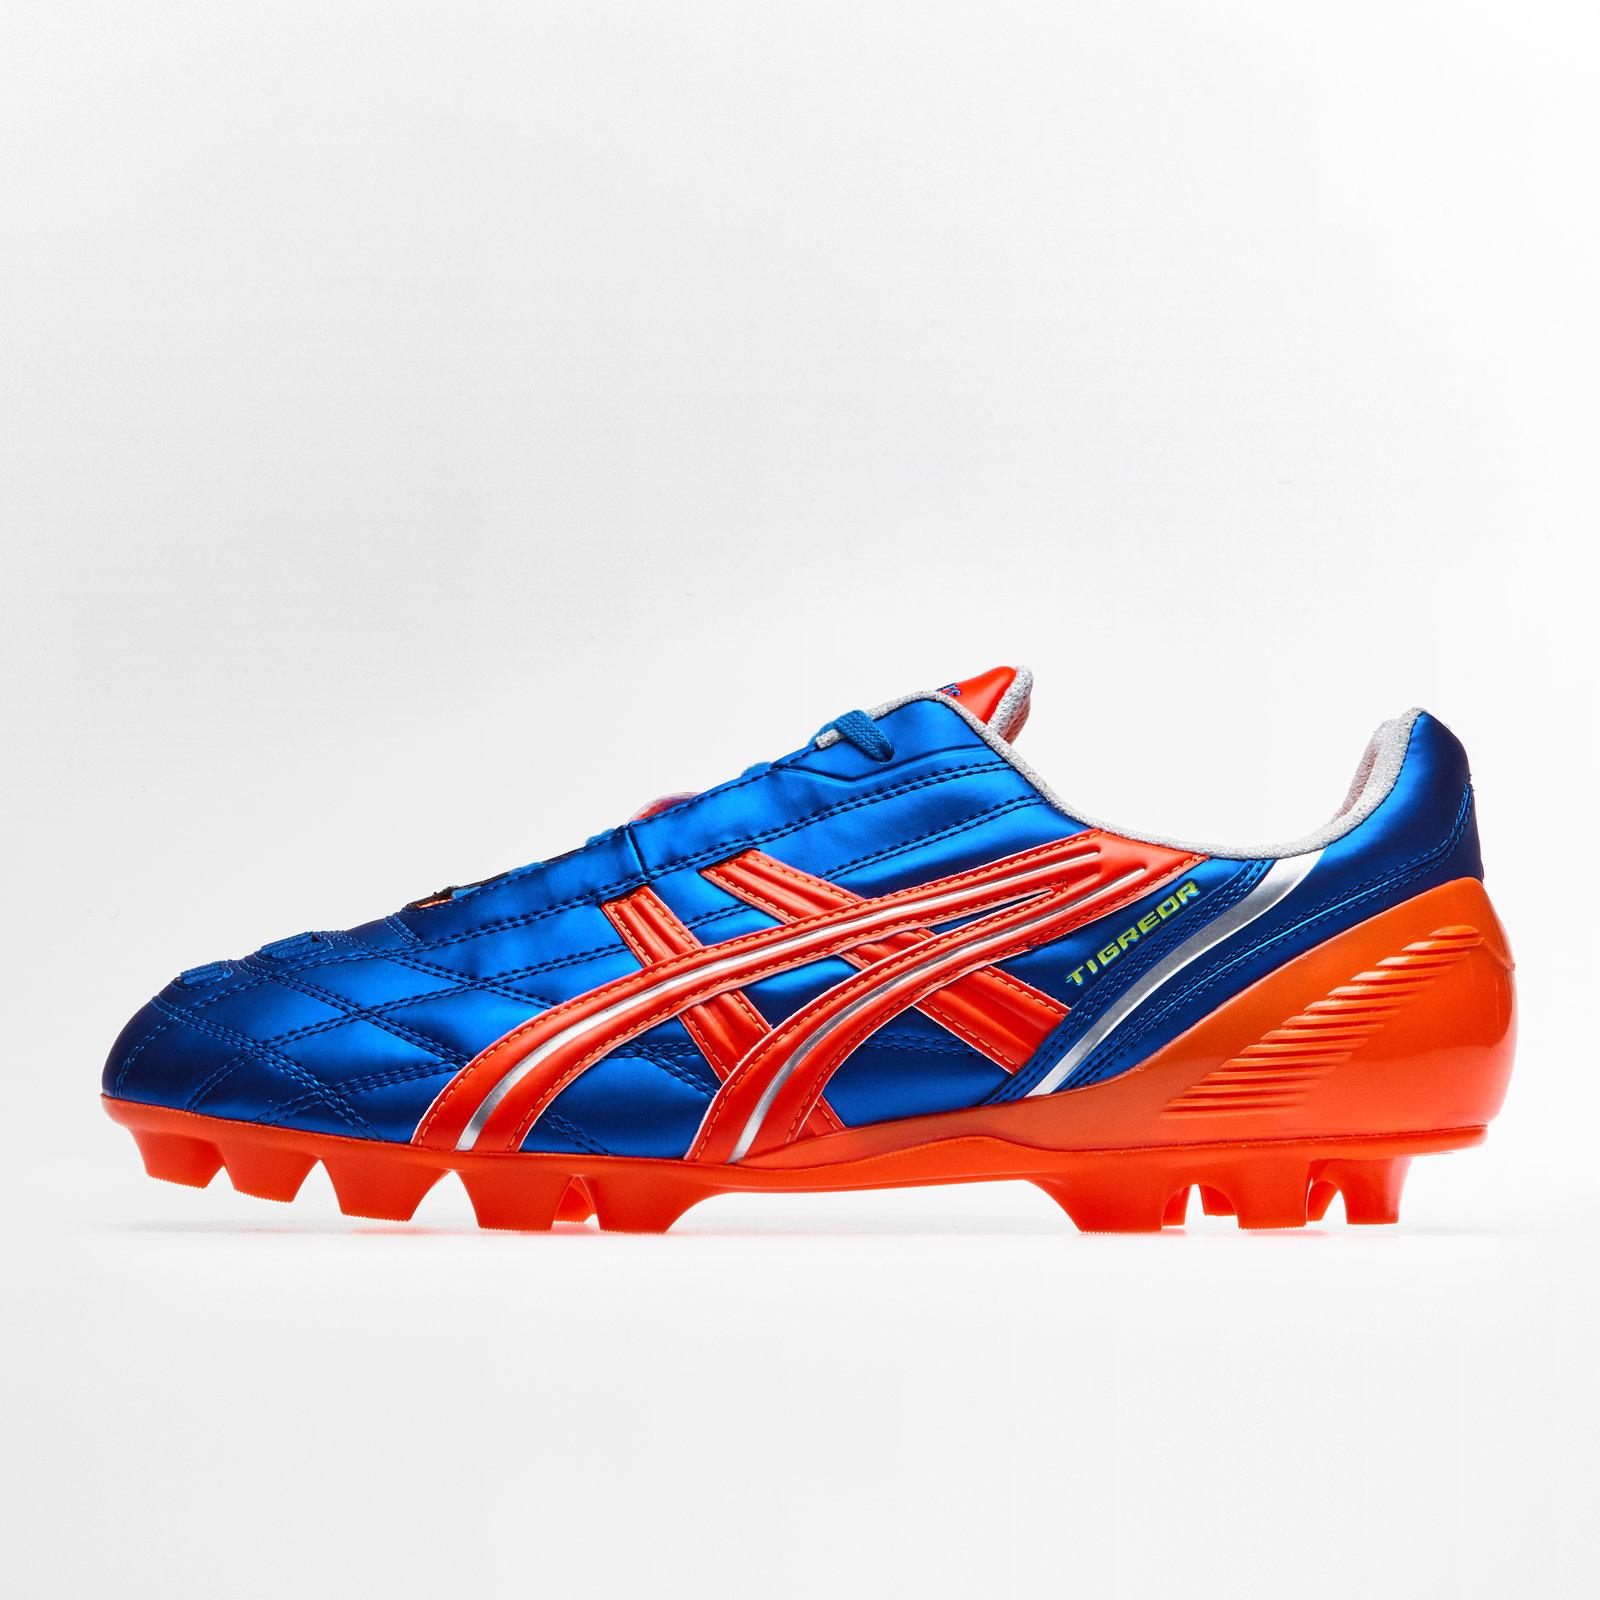 faa0560127df Asics Tigreor IT FG Football Boots | PJ408-4730 | FOOTY.COM